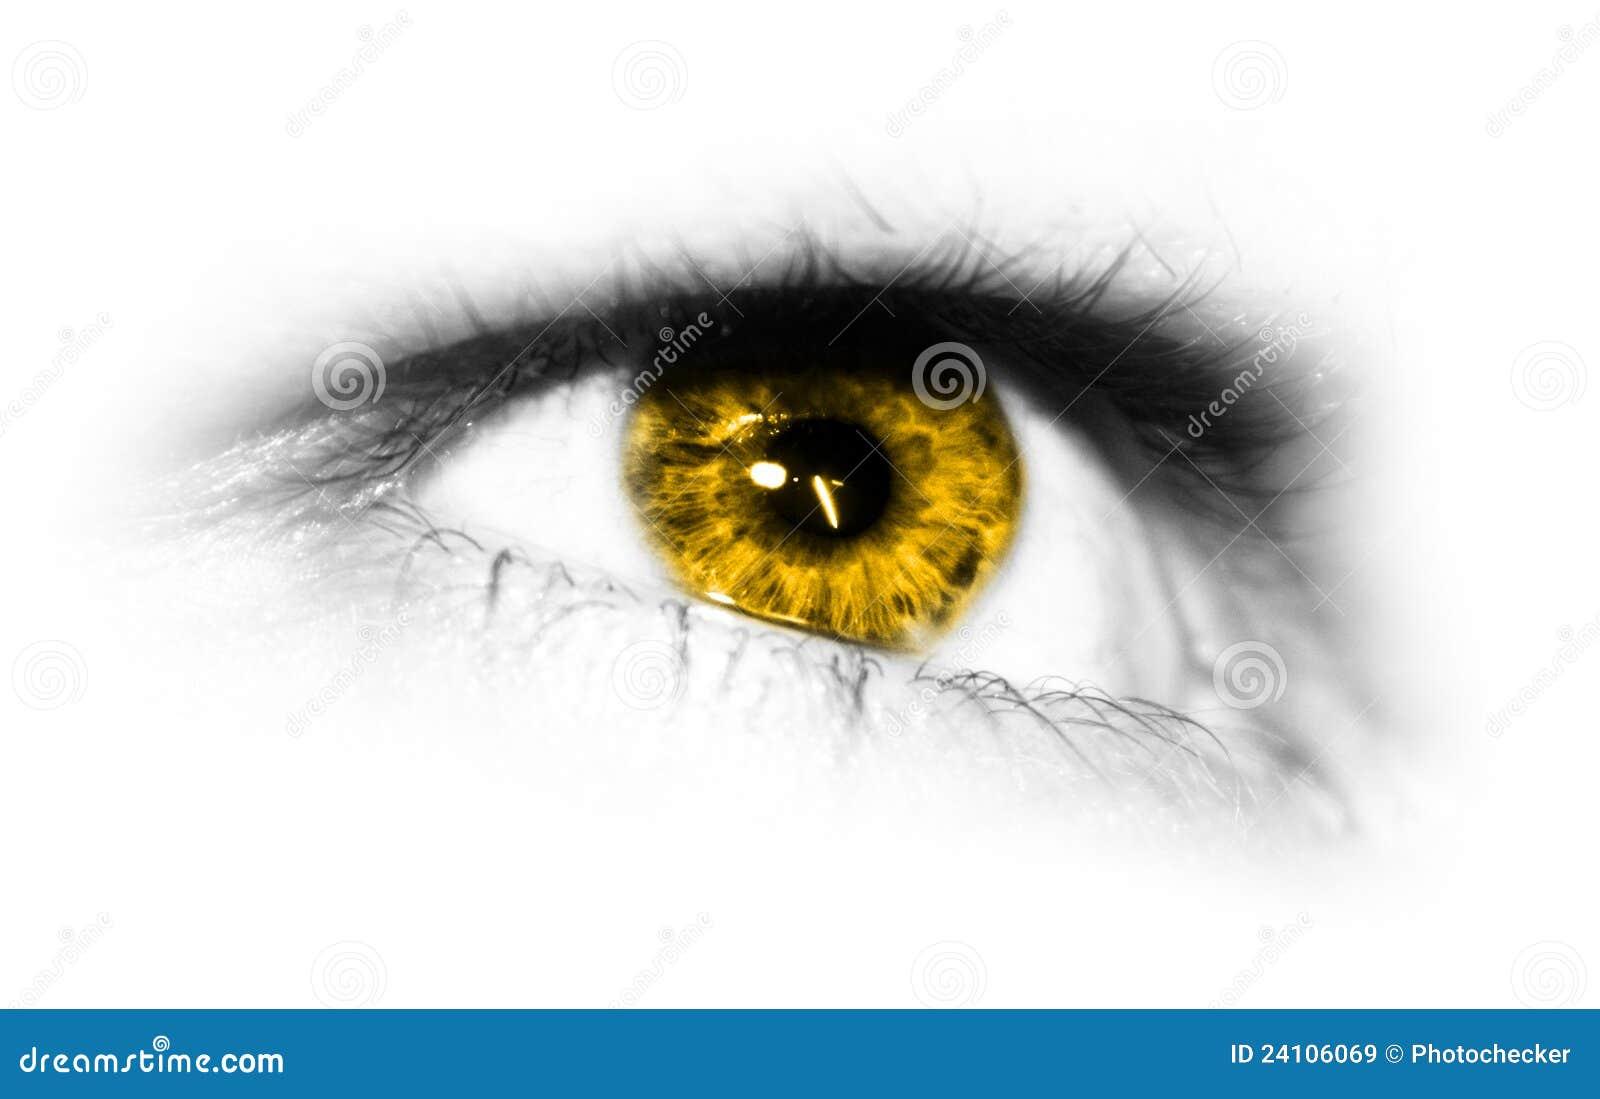 yellow eyes human - photo #25